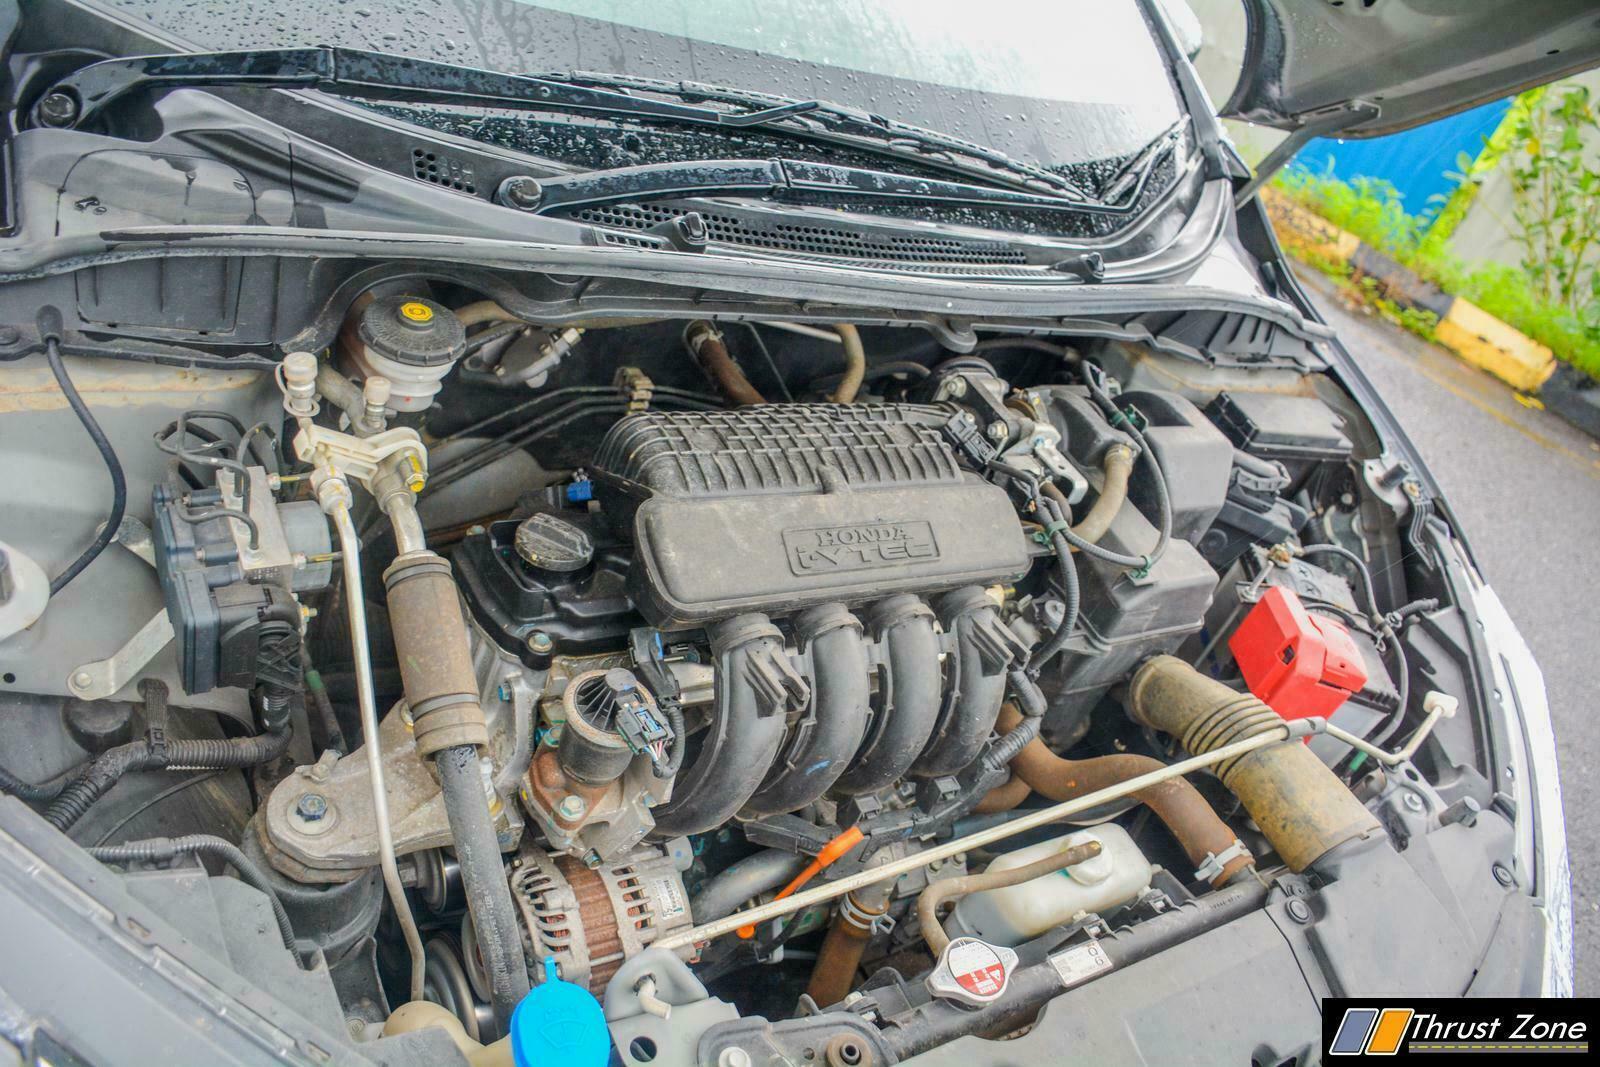 2019-Honda-City-Facelift-petrol-diesel-review-13